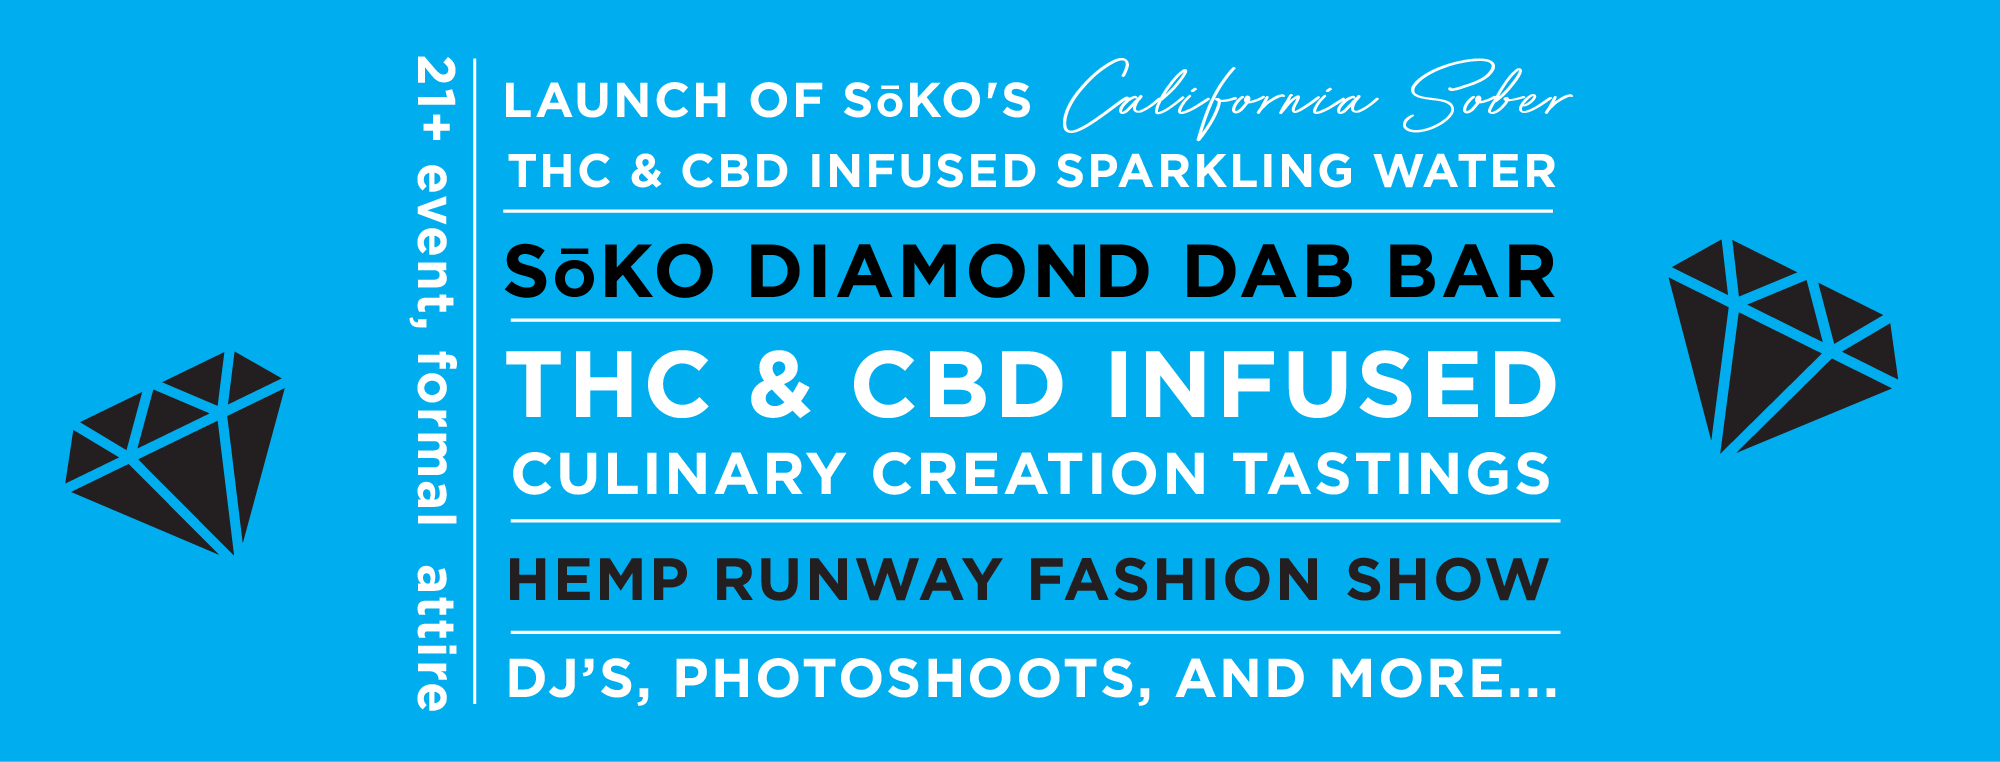 SOKO-DIAMOND-CANNA-INFO-03.png